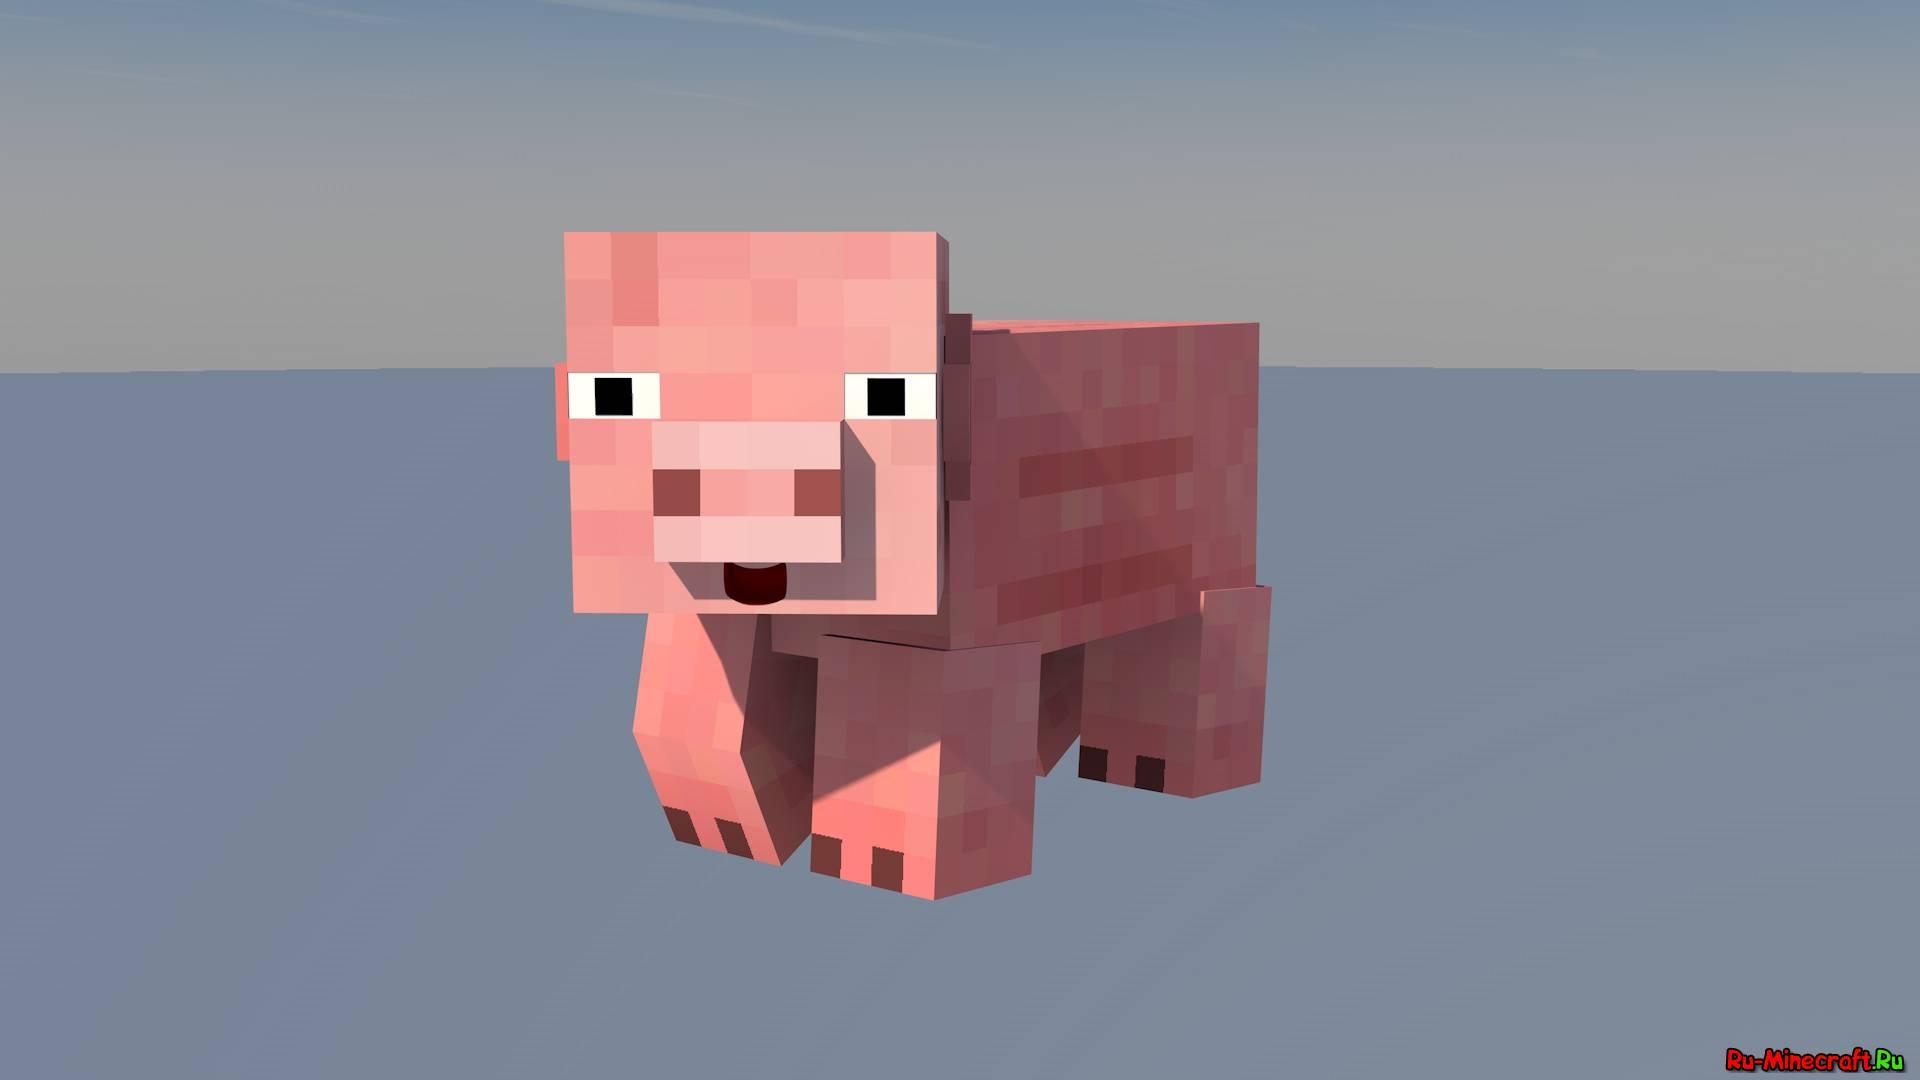 майнкрафт свинья картинка